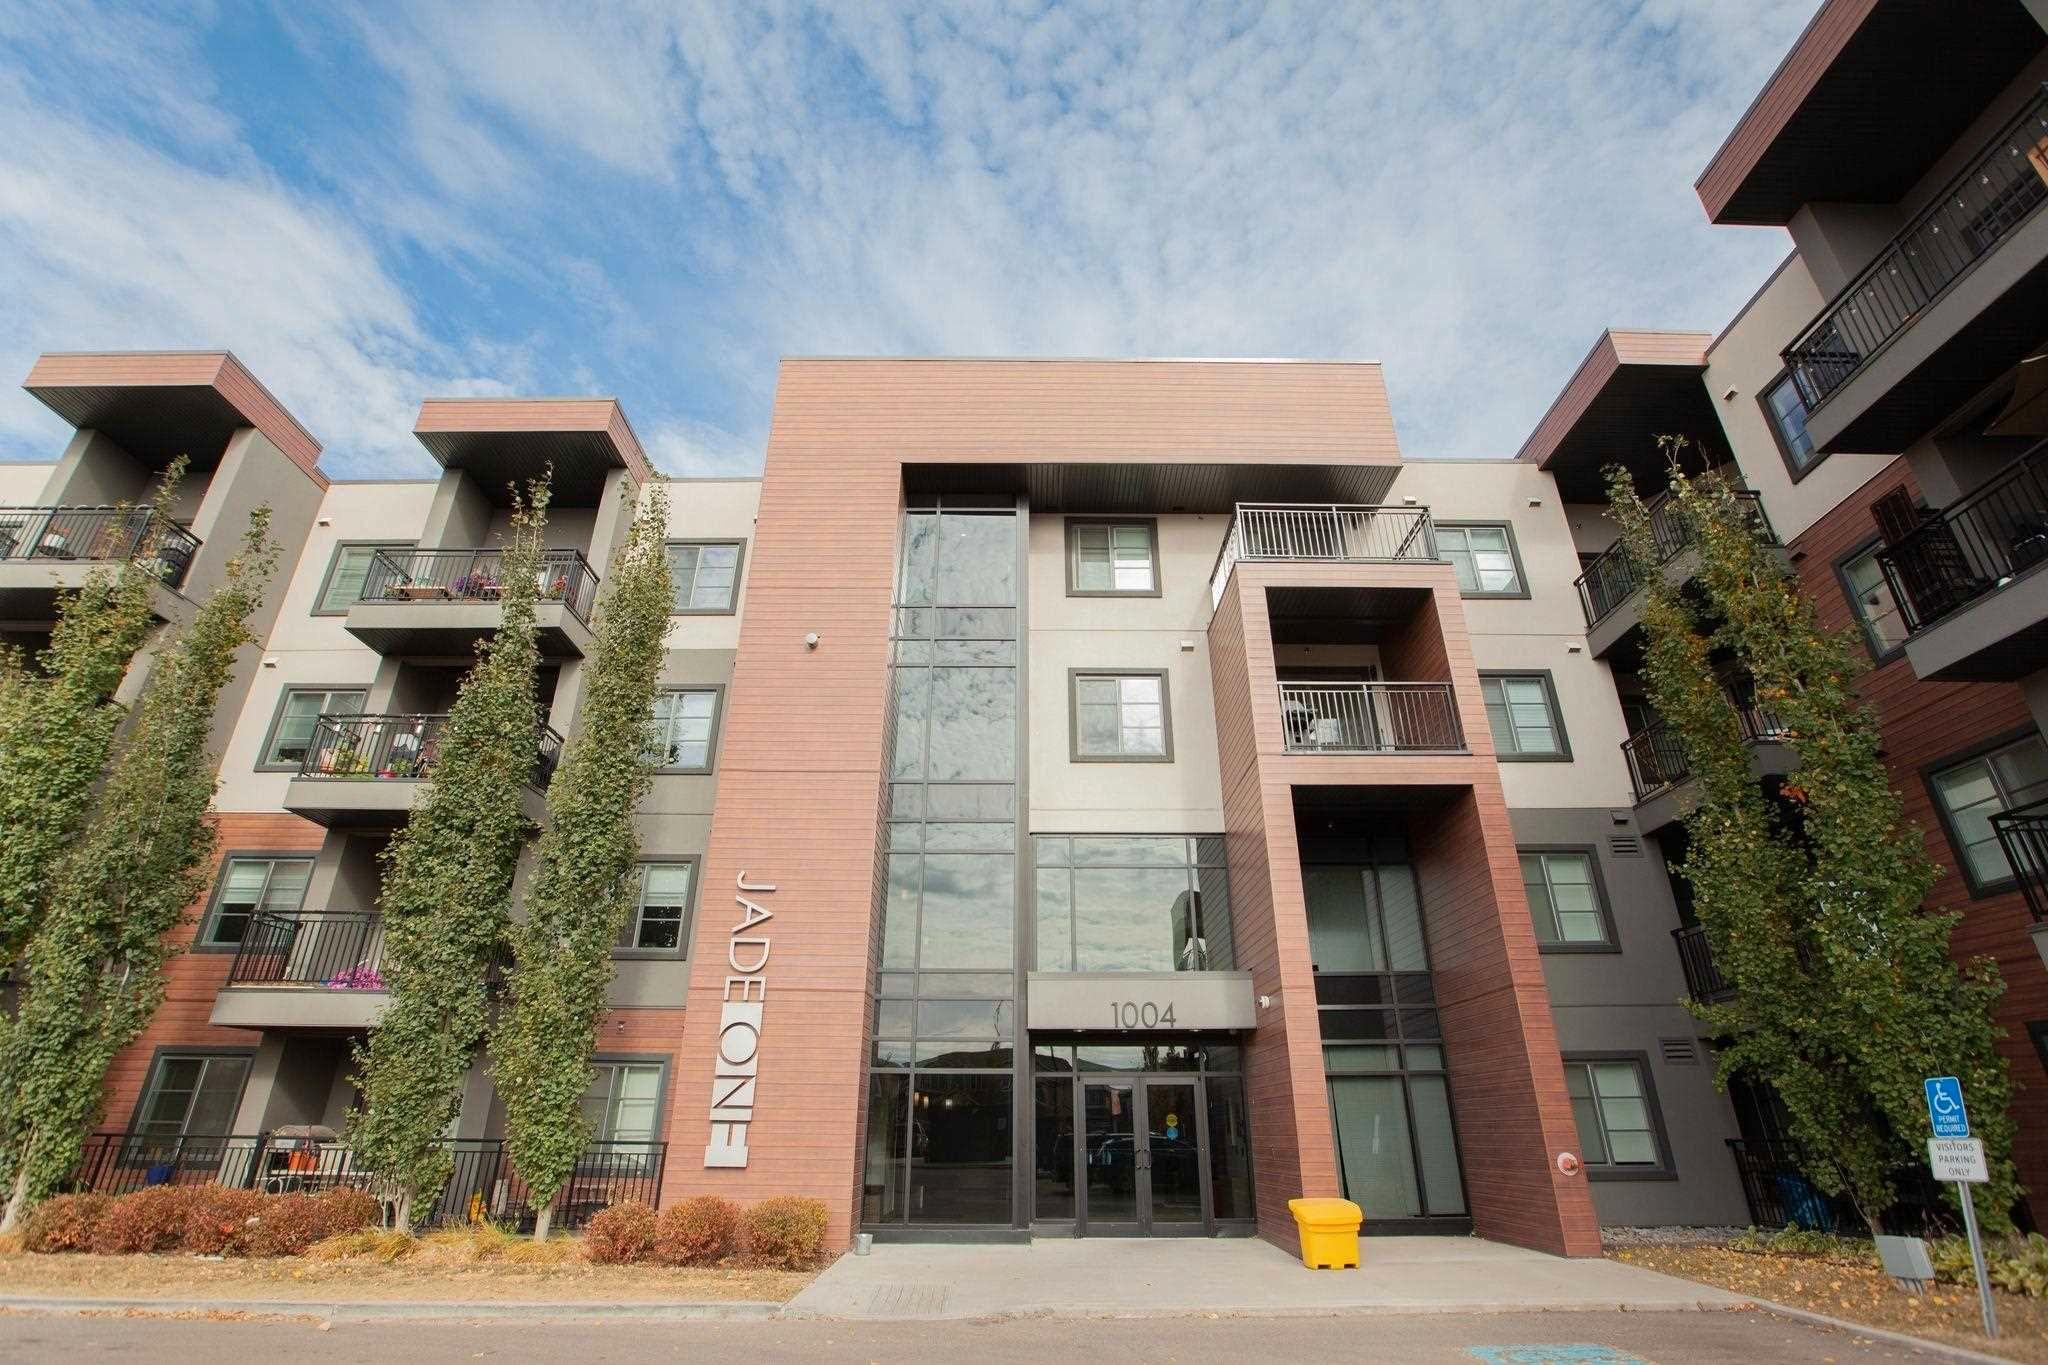 Main Photo: 407 1004 ROSENTHAL Boulevard in Edmonton: Zone 58 Condo for sale : MLS®# E4248881